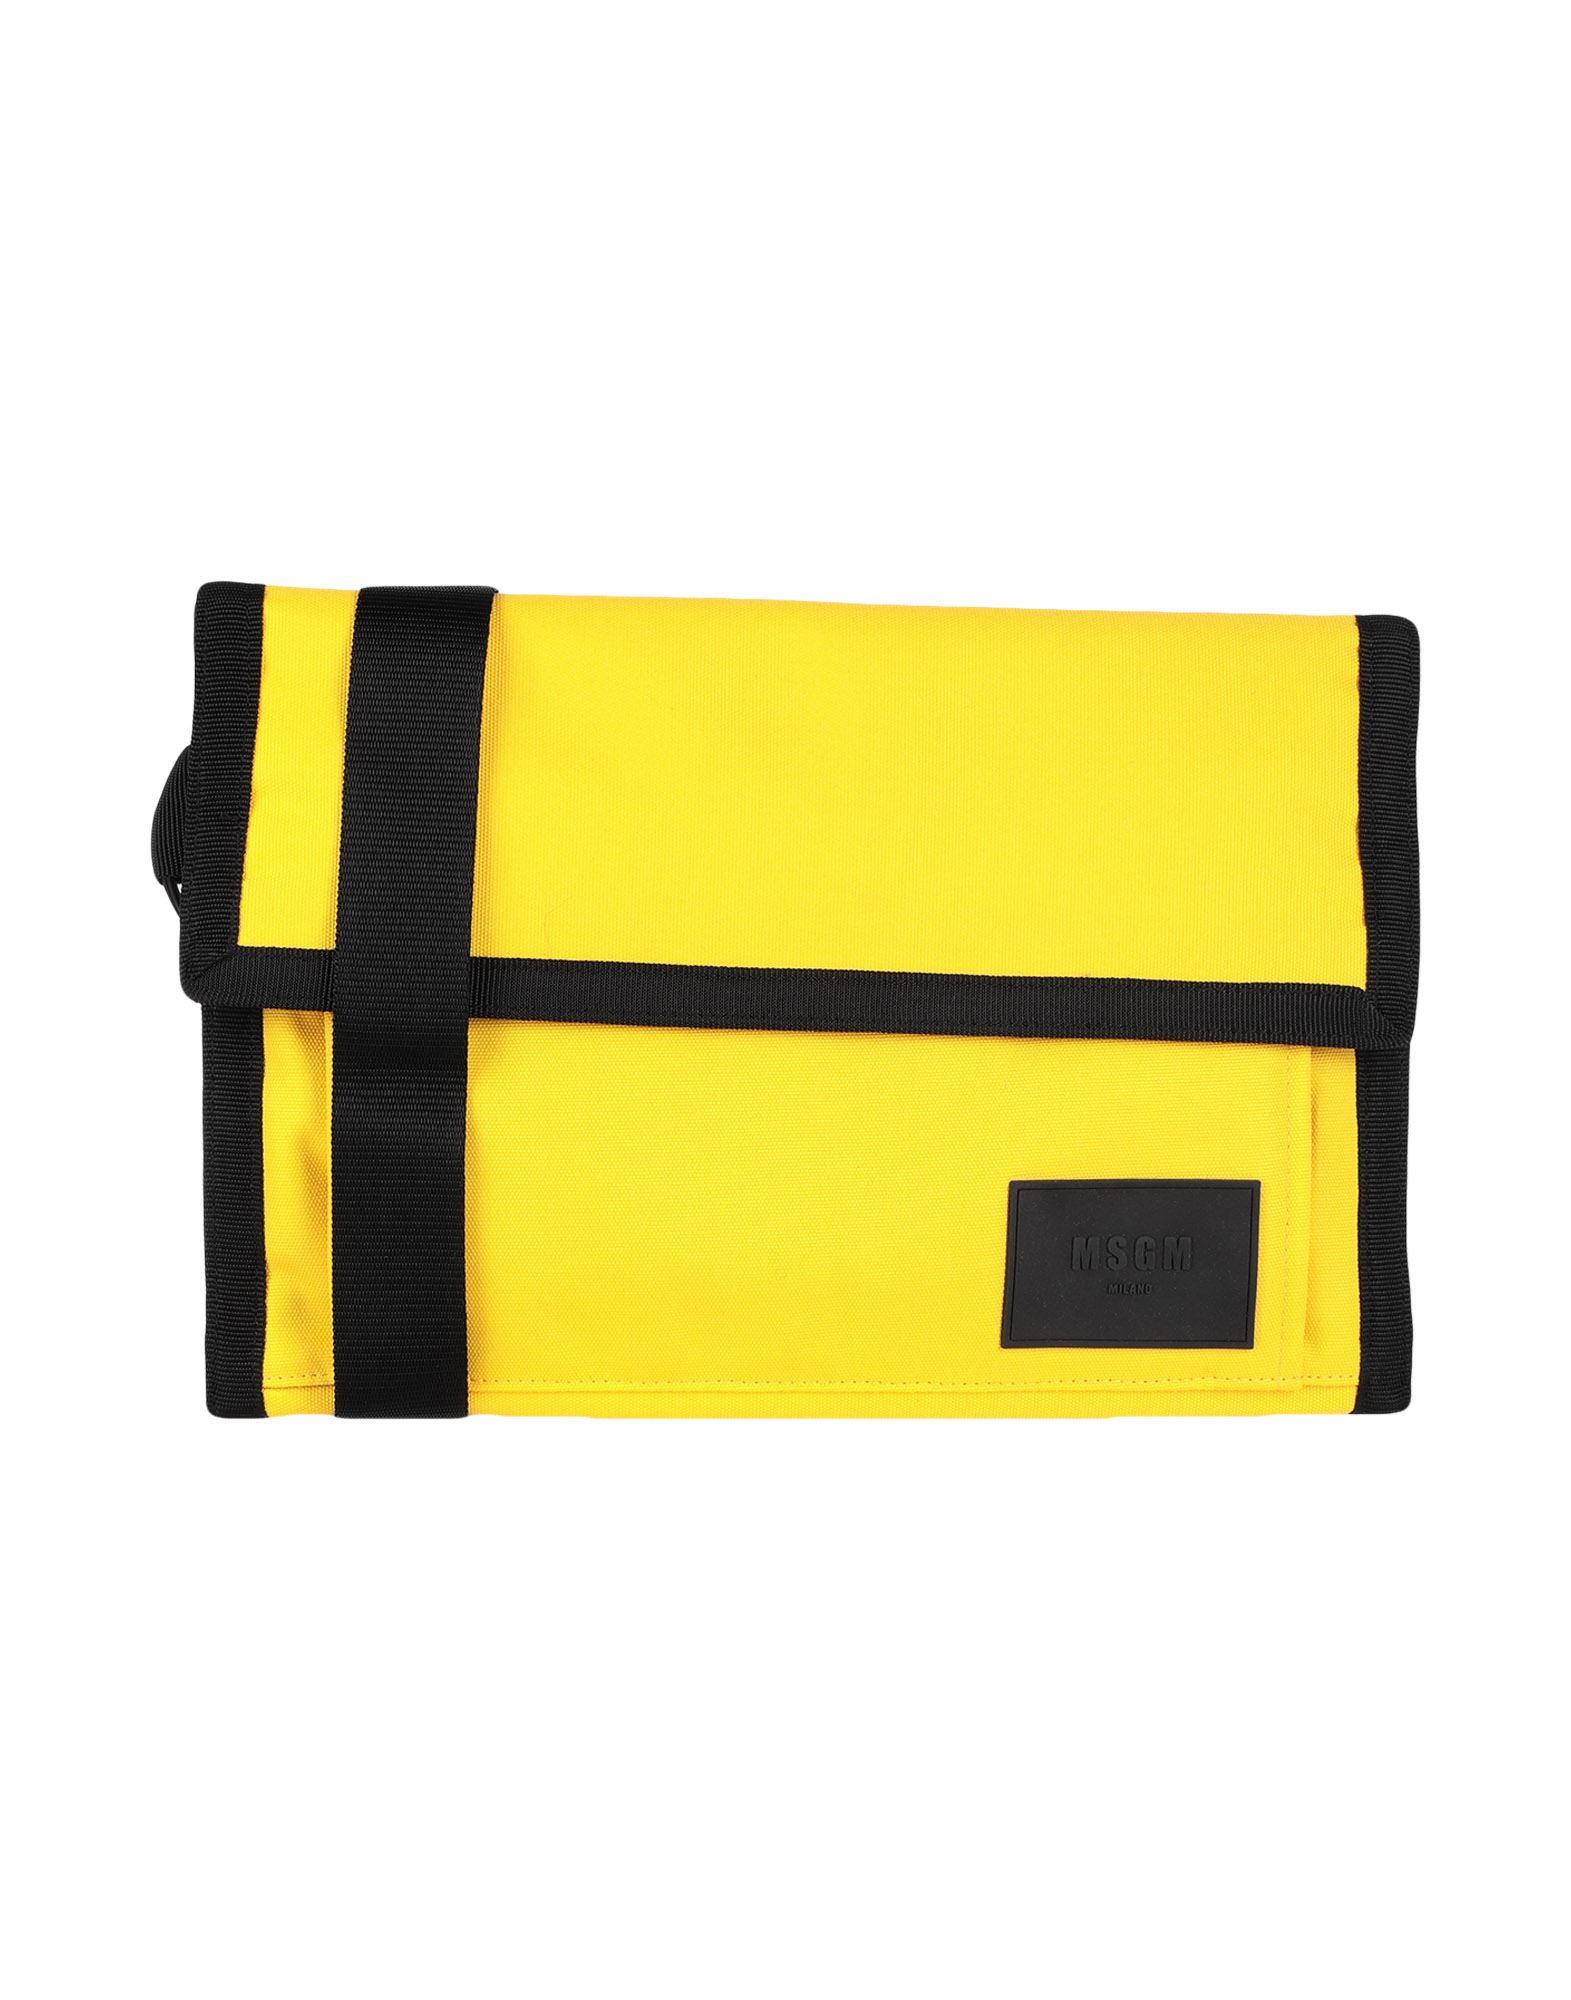 dunhill деловые сумки MSGM Деловые сумки